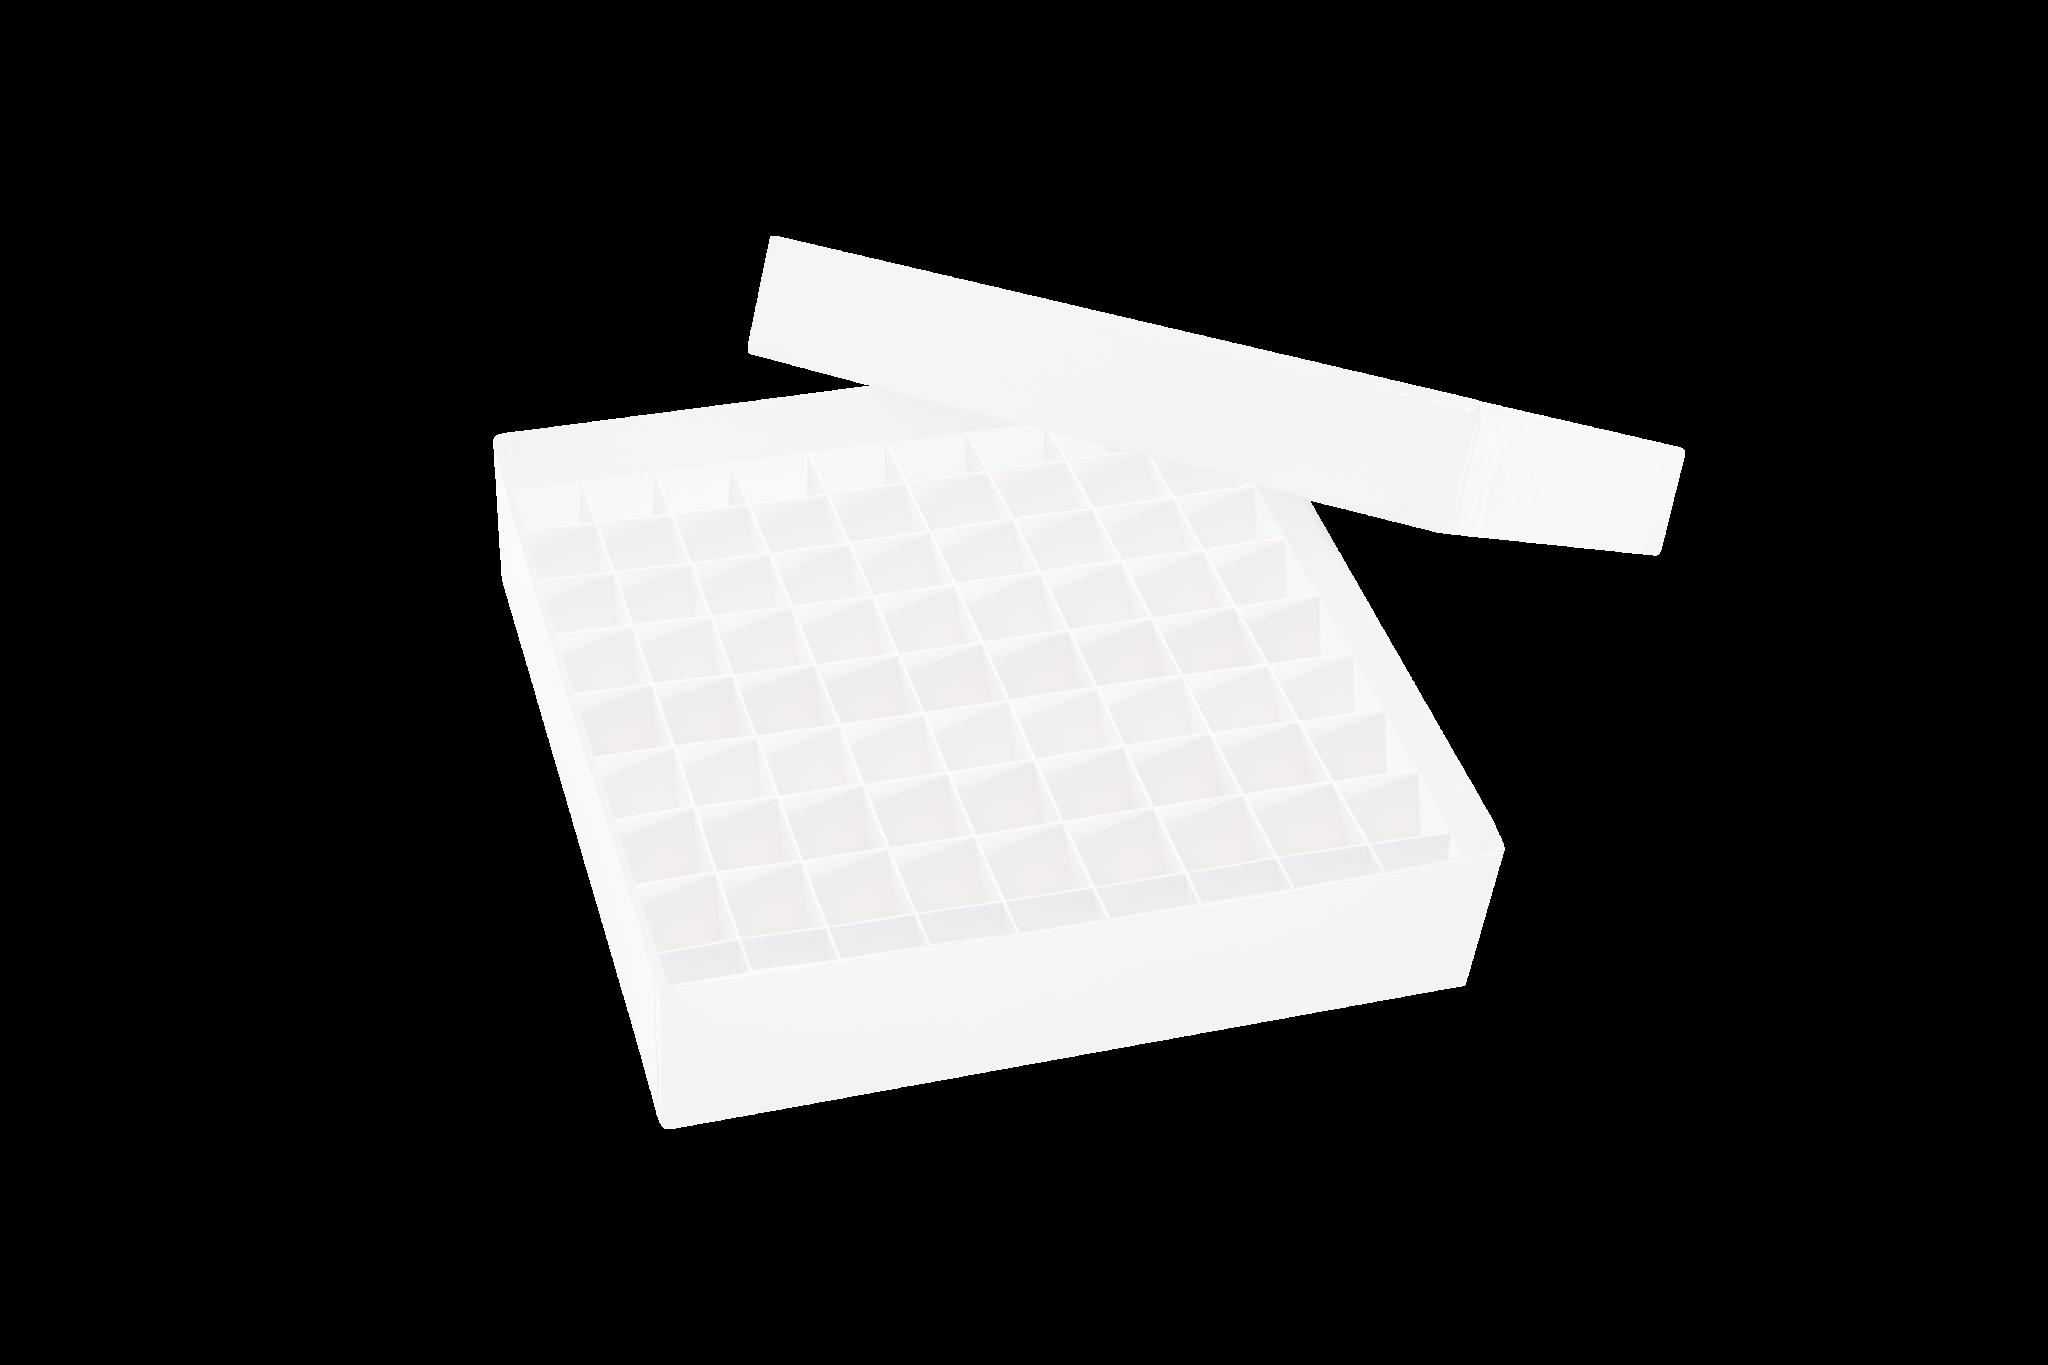 cryobox 9x9, cryogenic vial holder, cryogenic vial holders, cryovial holder, cryovial holders